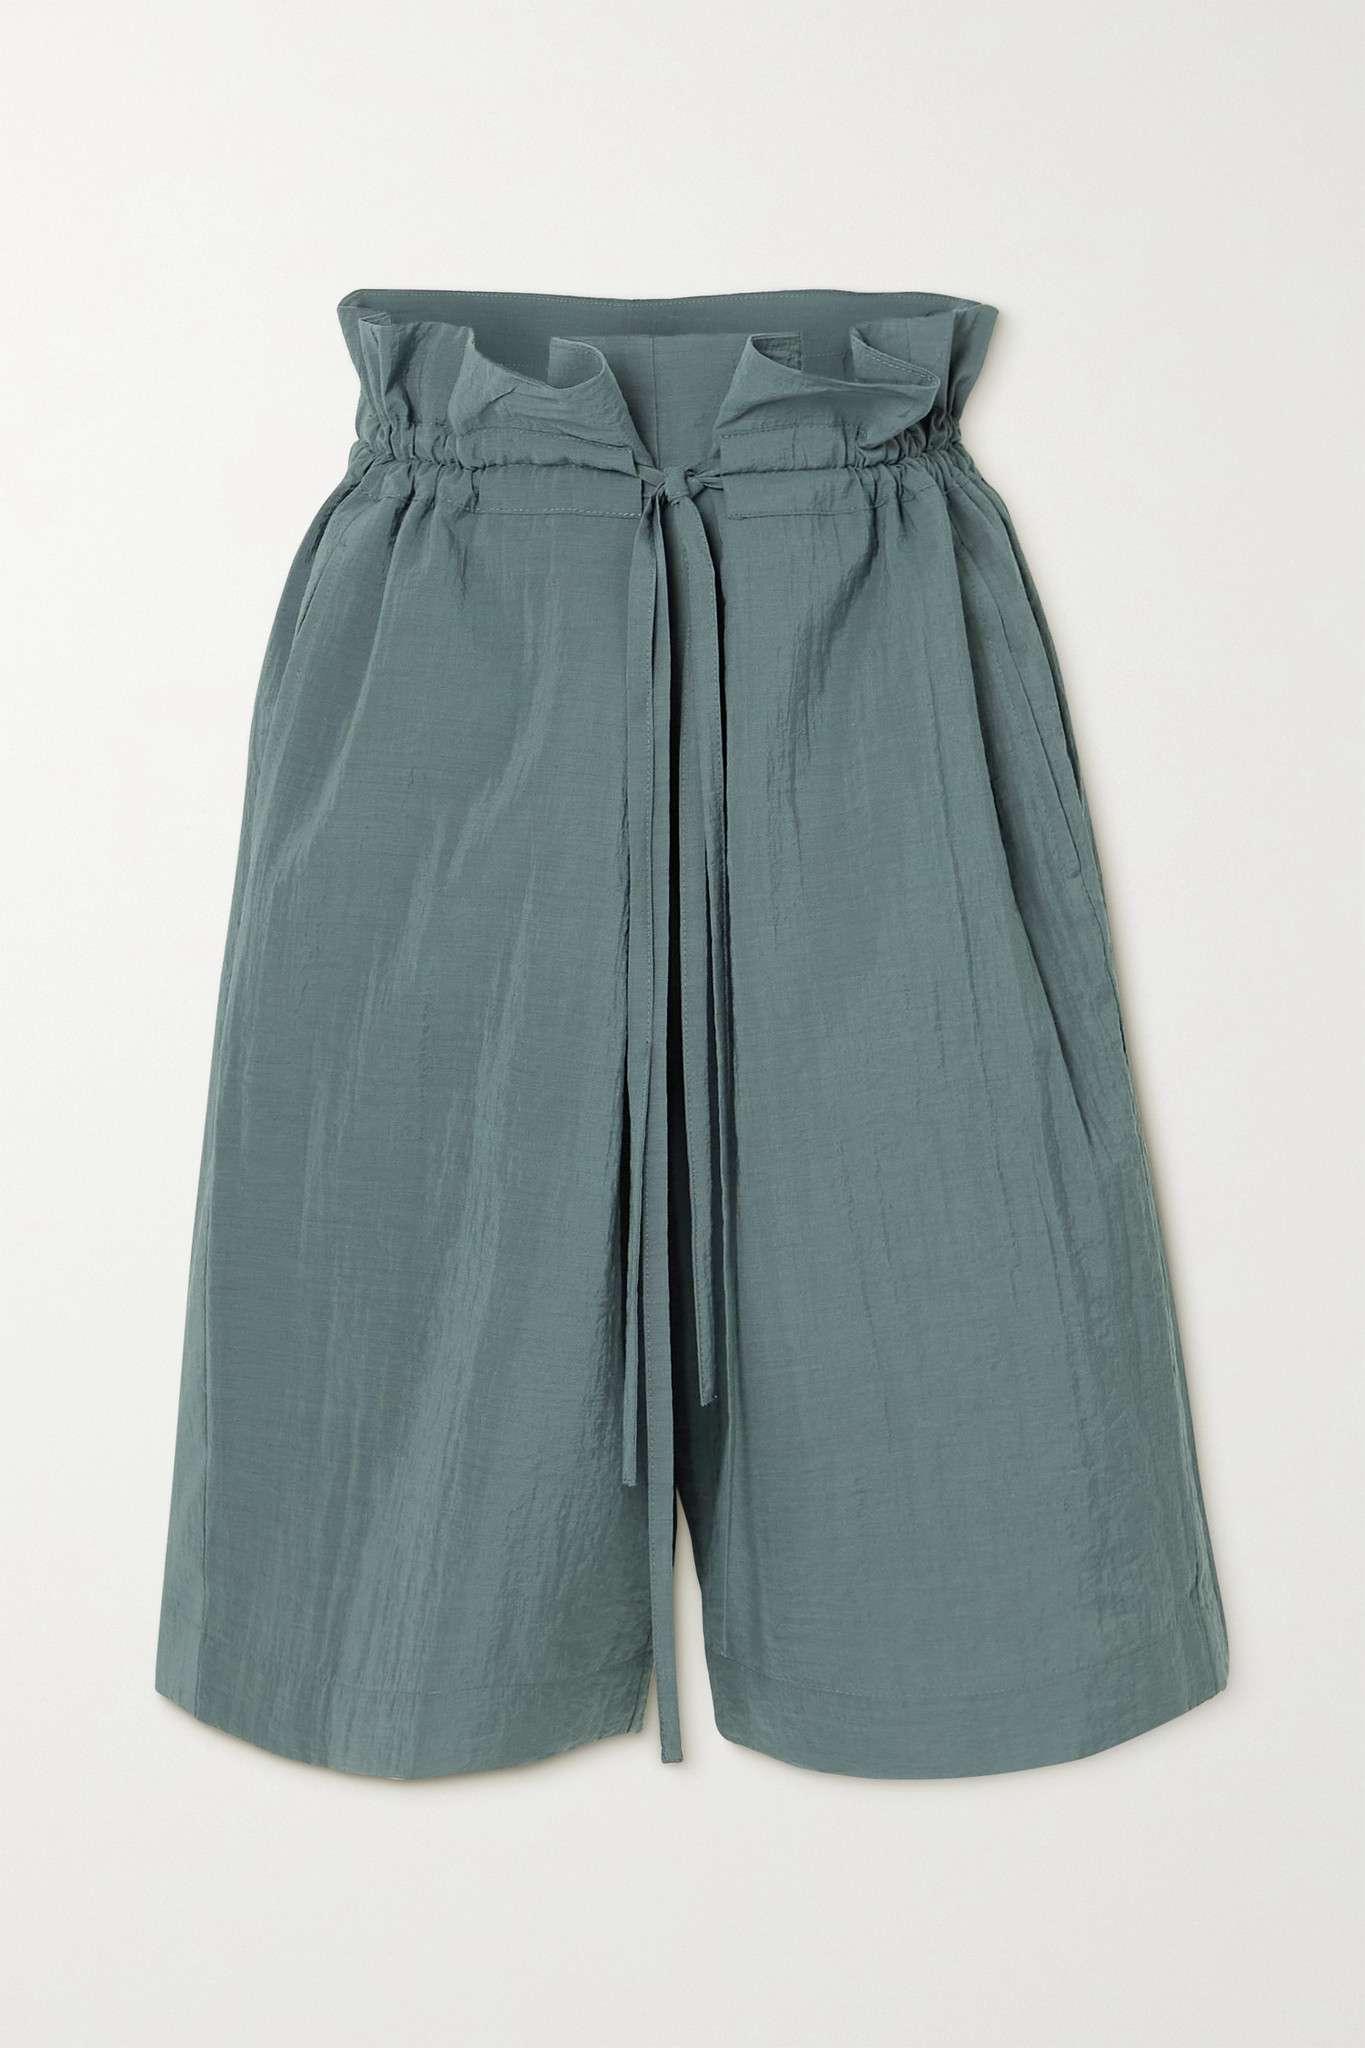 Le 17 Septembre Belted Crinkled Woven Shorts